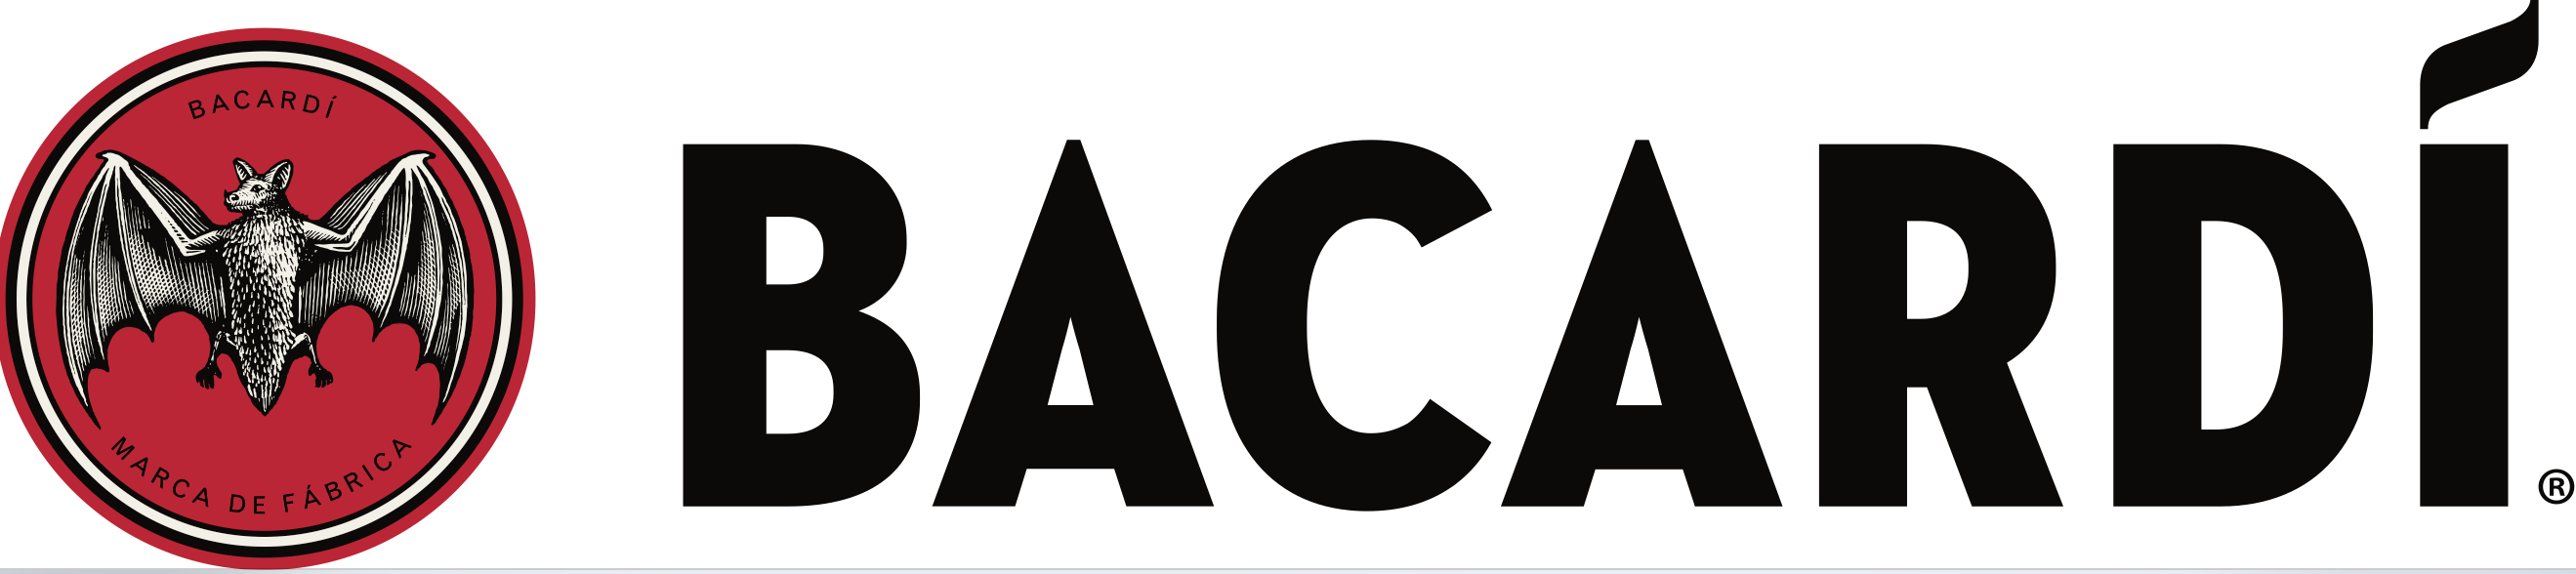 Bacardi - Badger Liquor